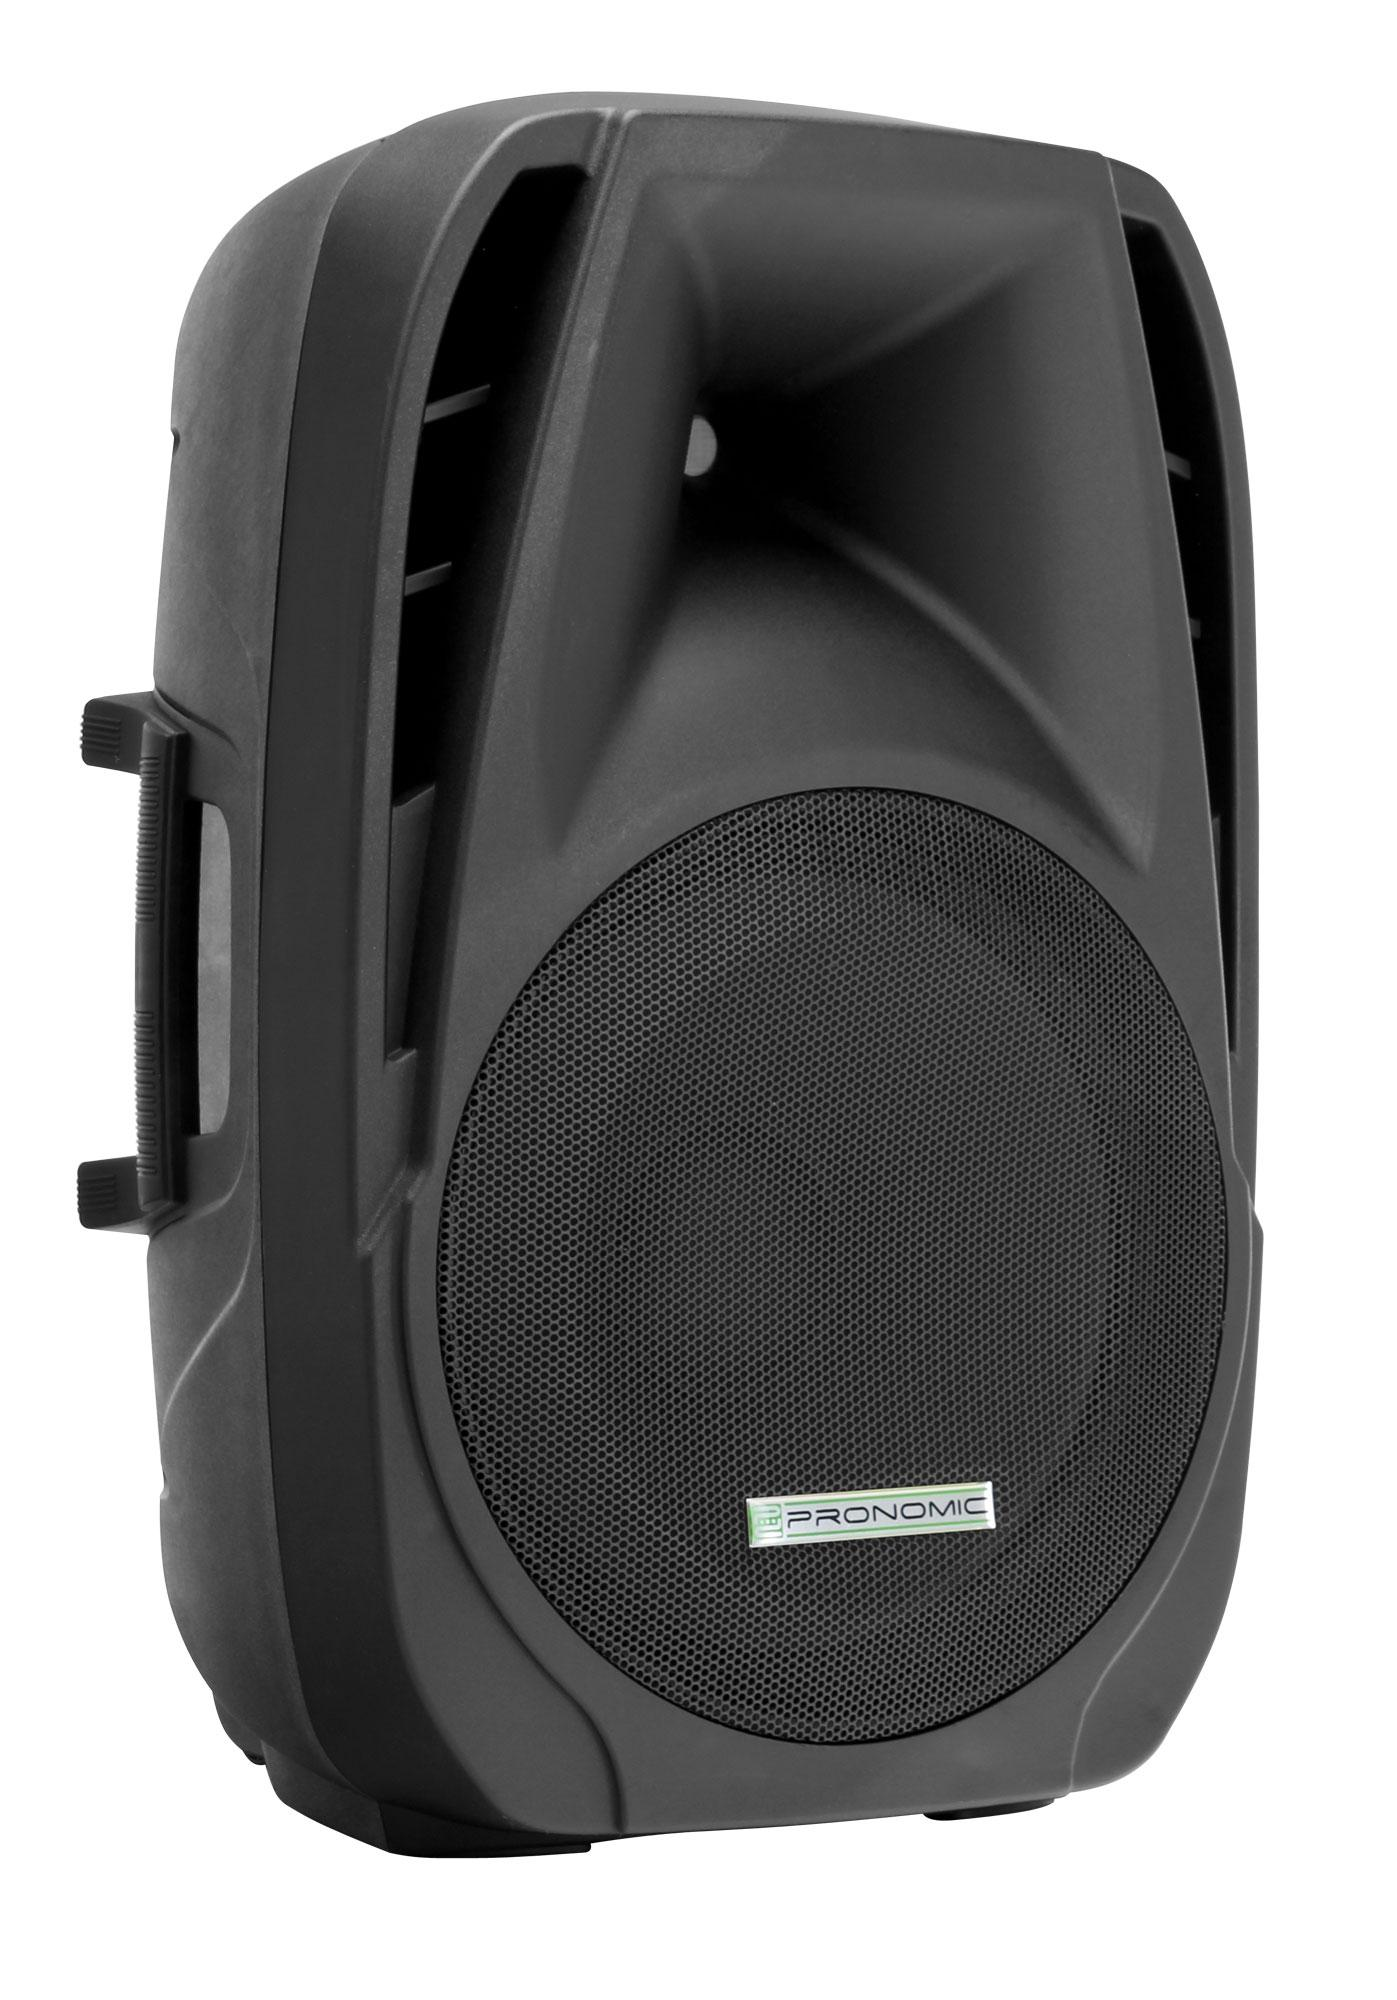 Pronomic PH15 Passivbox Lautsprecher 190|350 Watt Retoure (Zustand sehr gut)